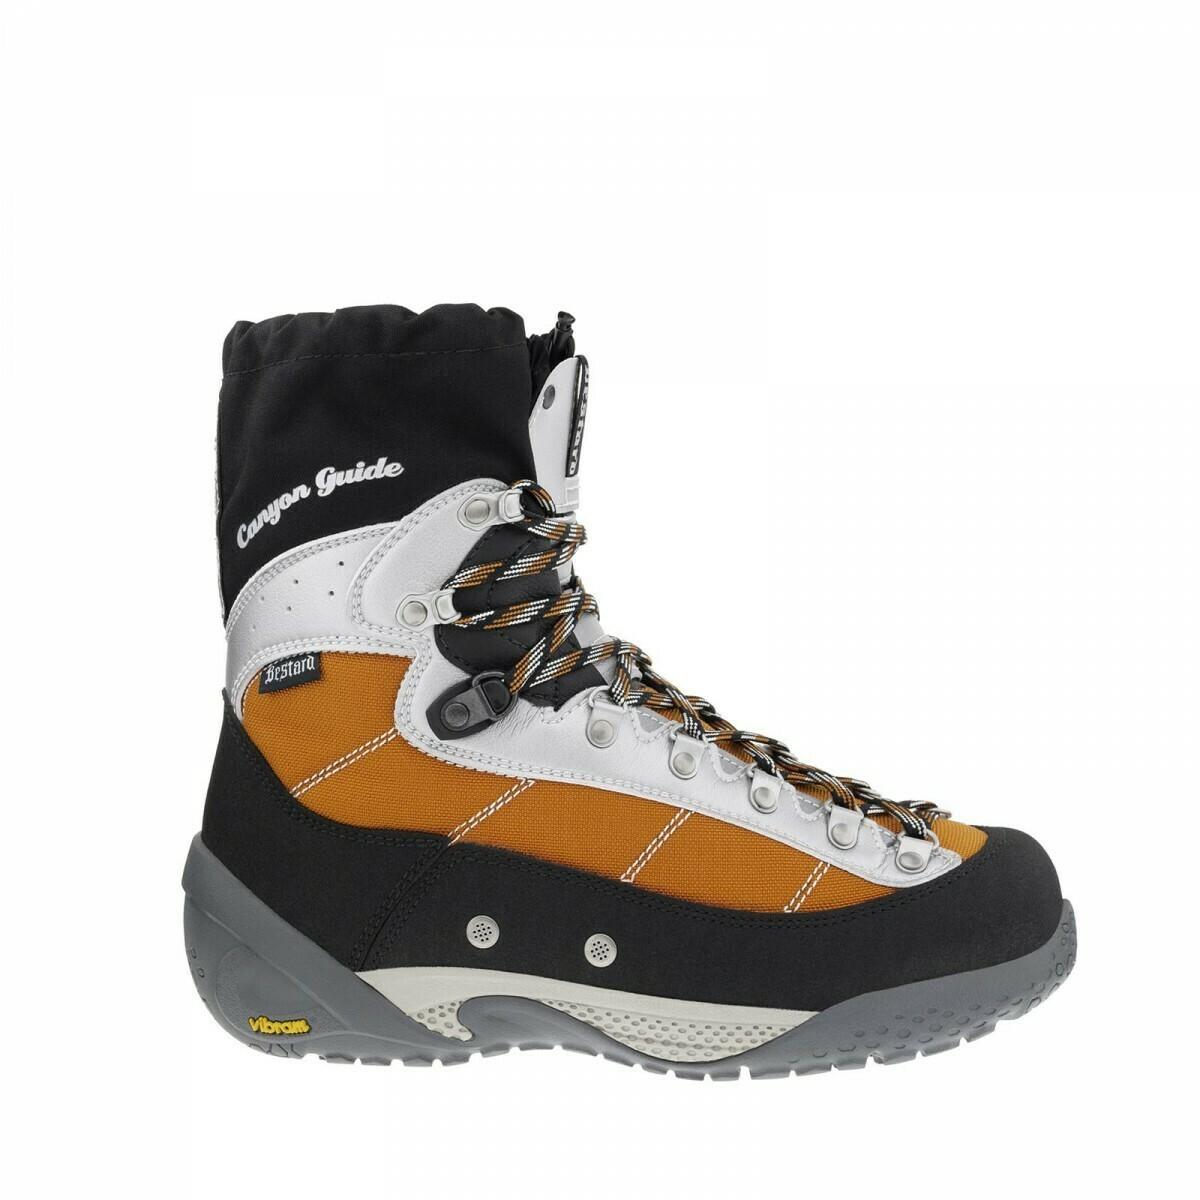 Bestard Canyoning Guide Canyoning Shoe